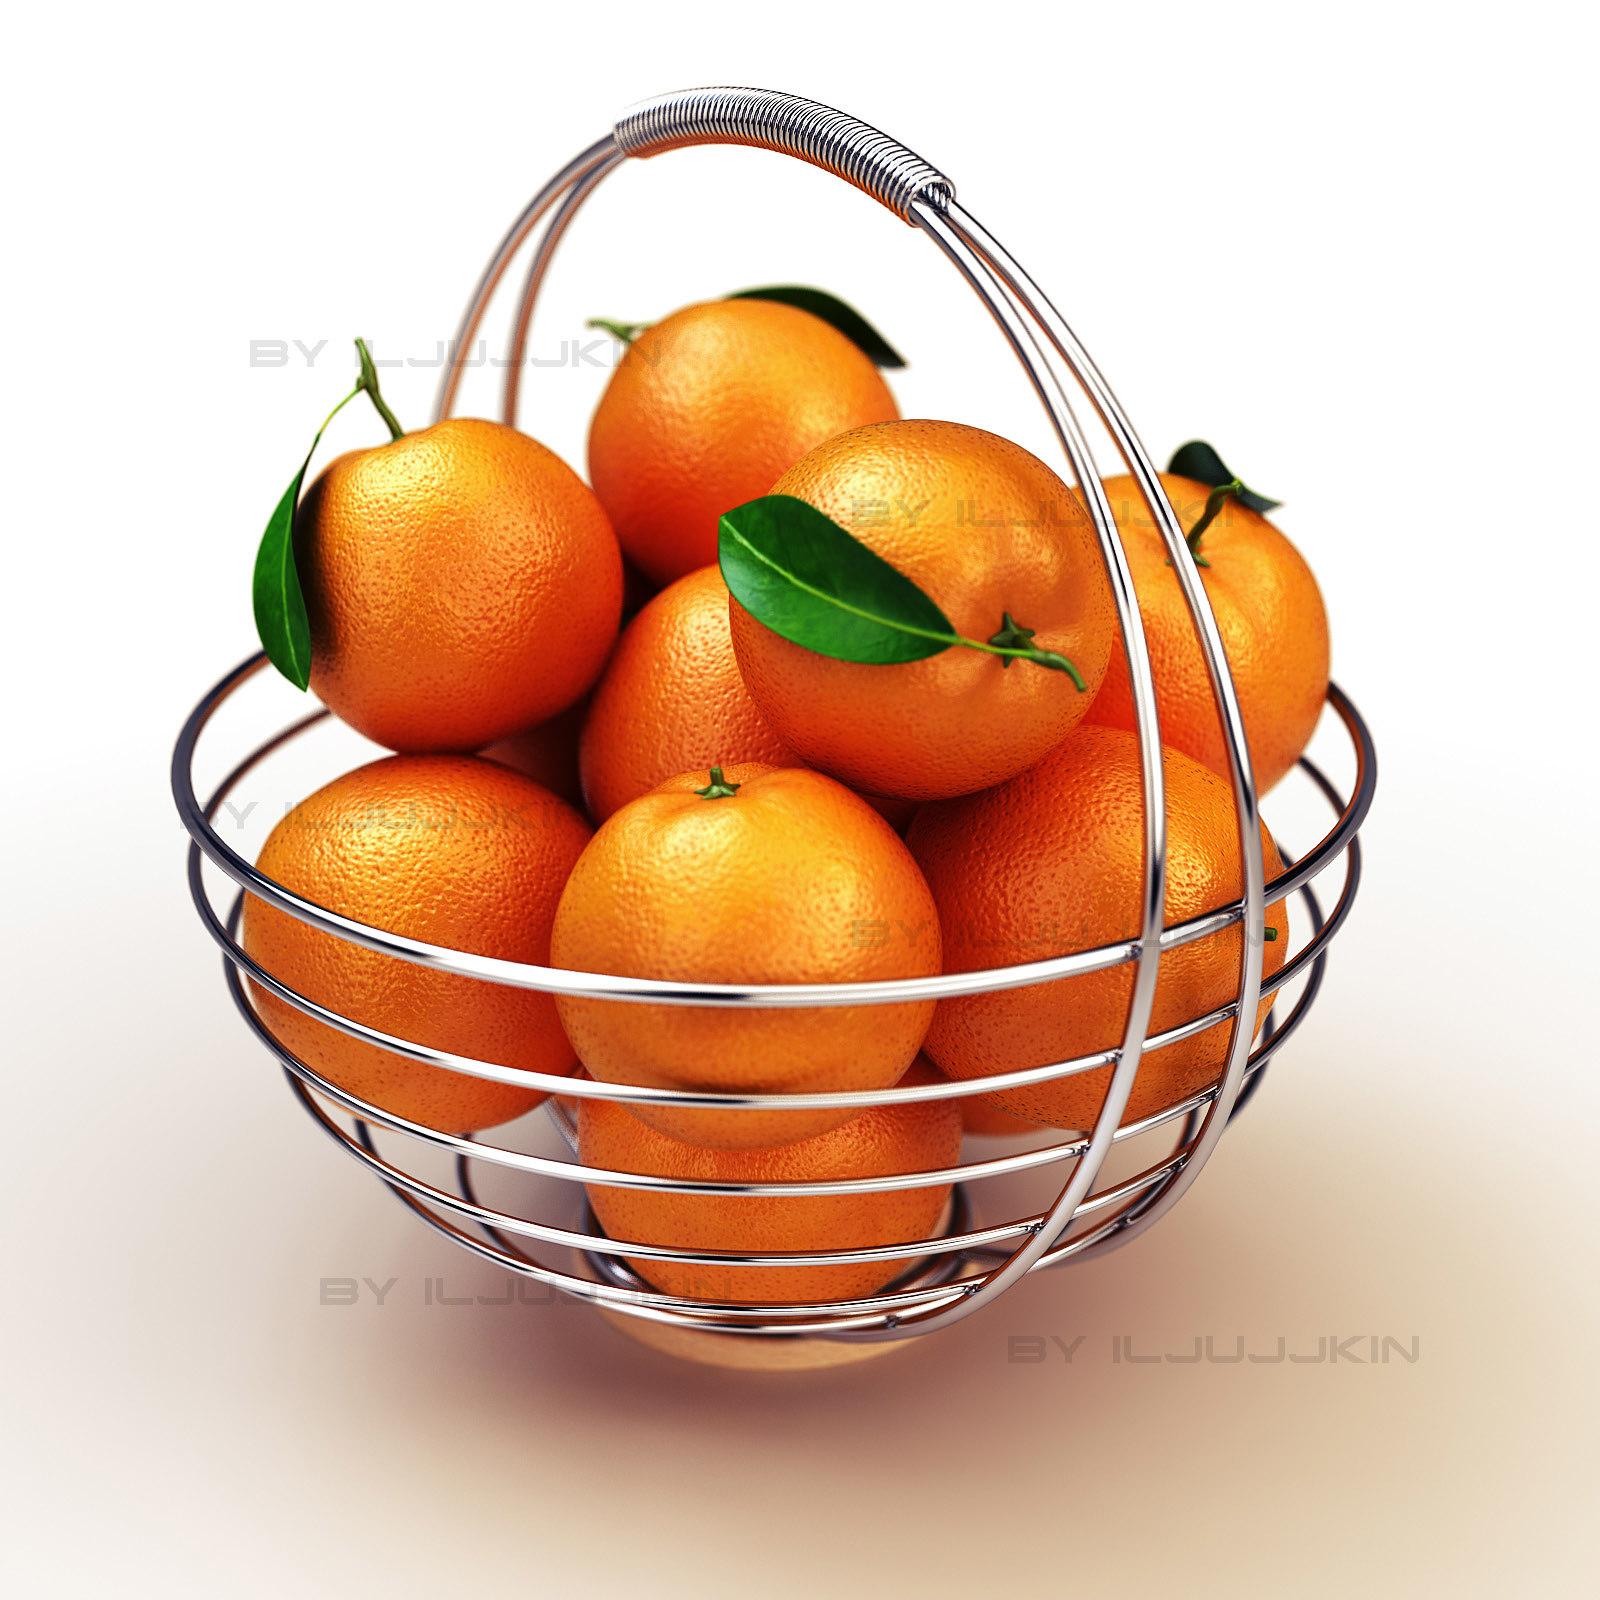 Basket_oranges_2.jpg